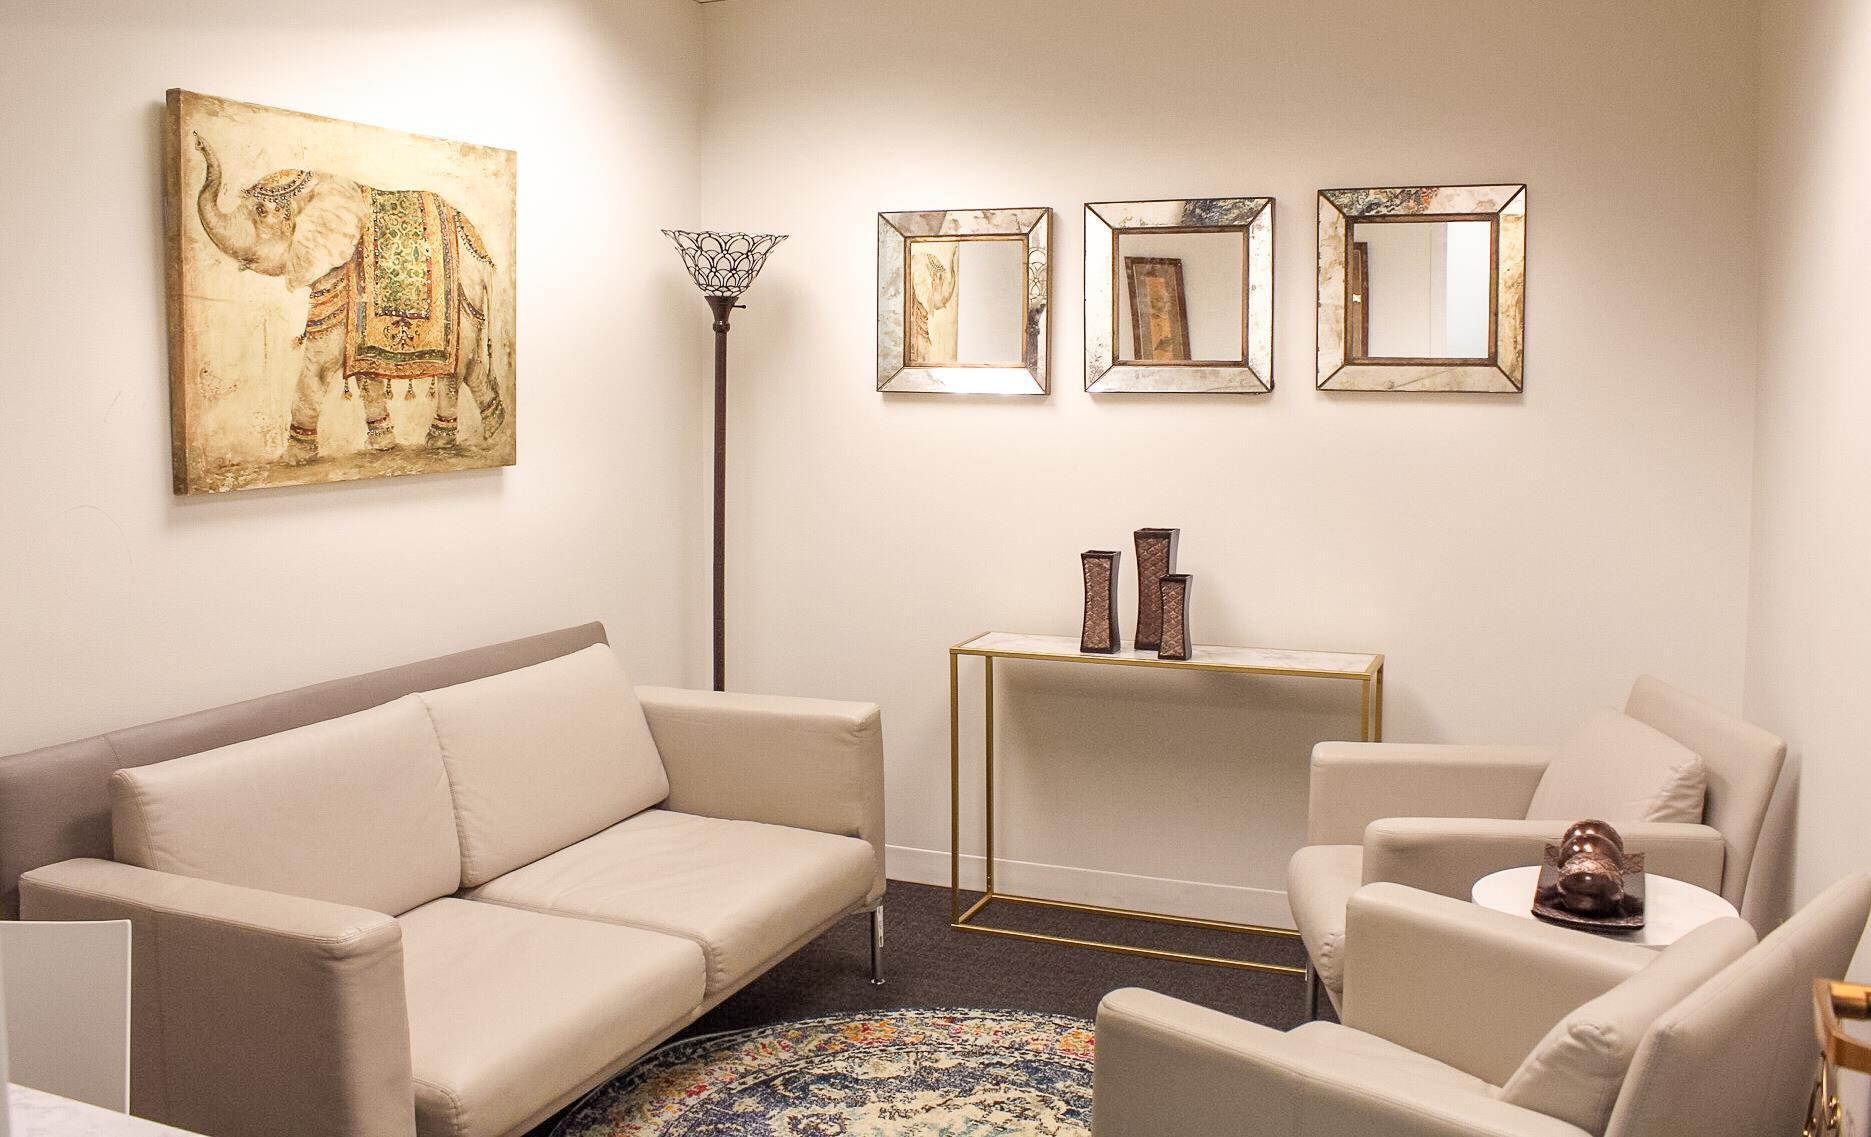 AdvantEdge Workspaces - Chevy Chase, DC Center - Mental Health Suite